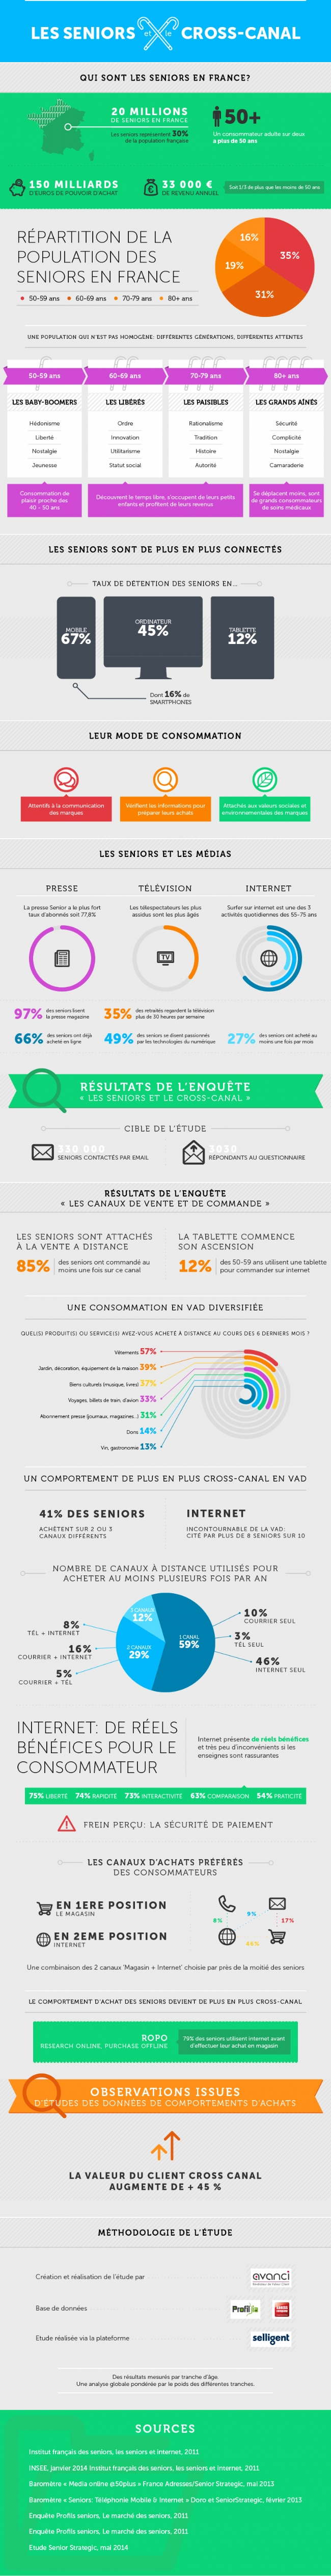 infographie-seniors-ecommerce